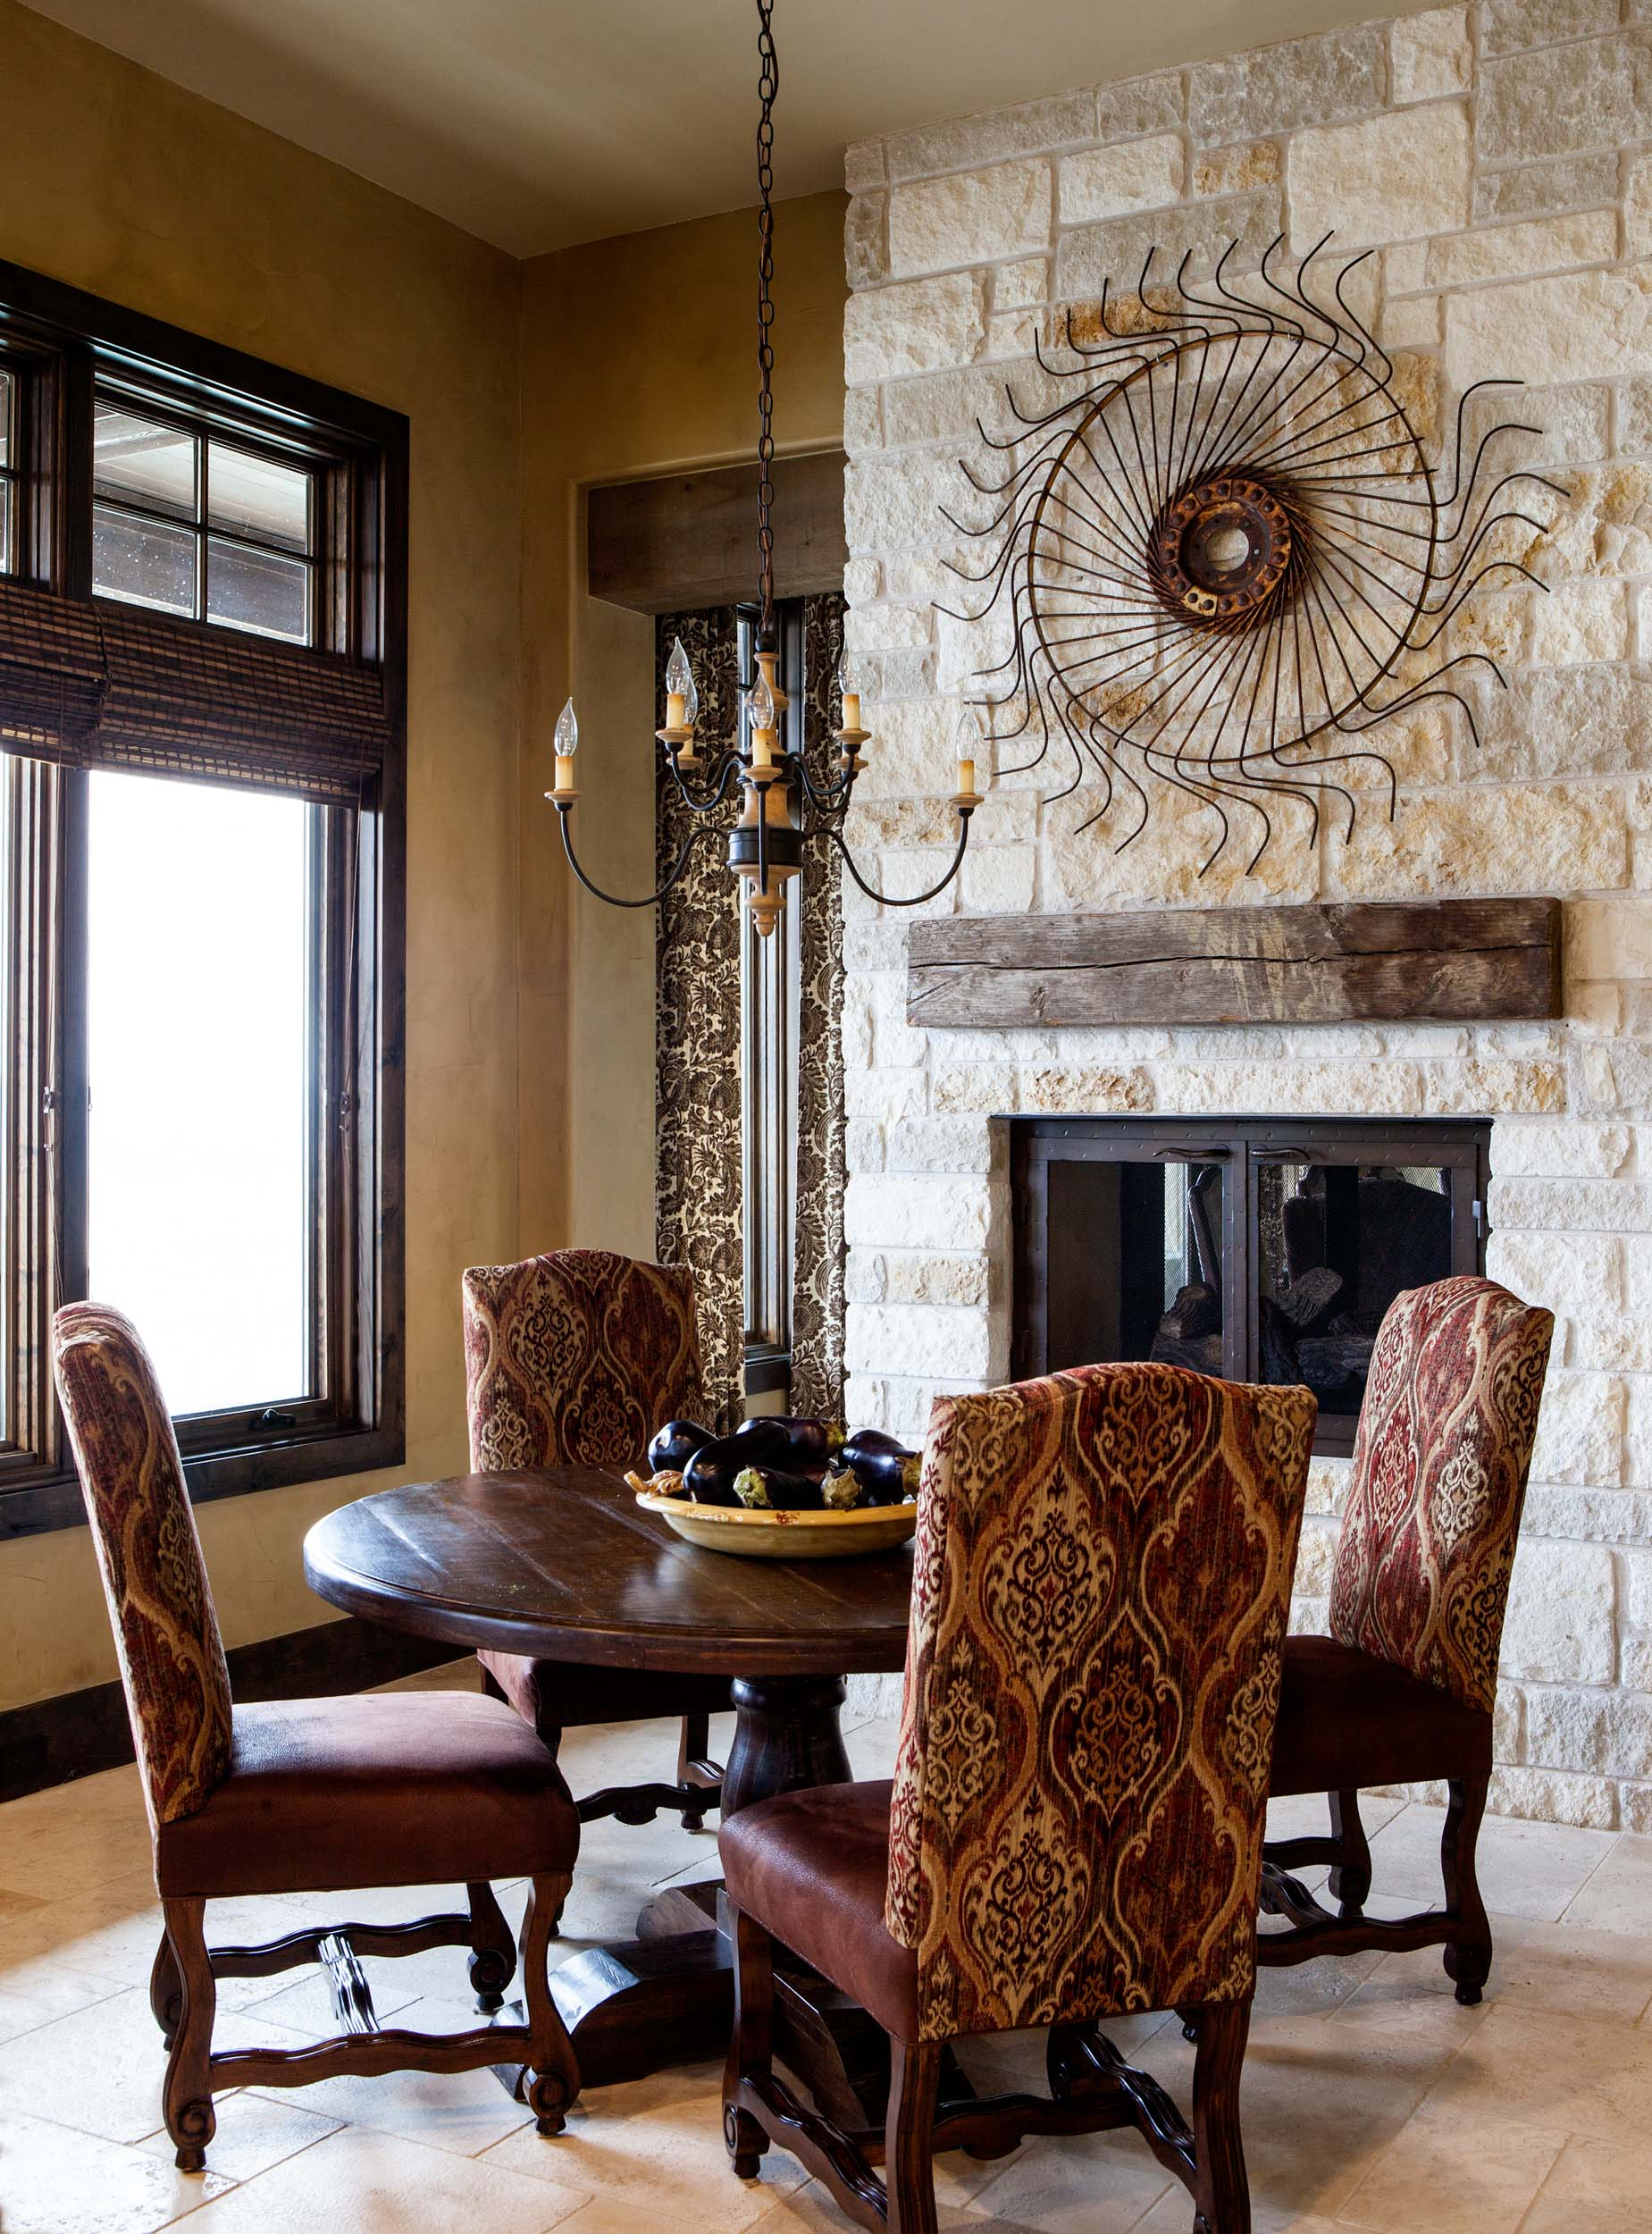 austin-house-kitchen-table-interior-design.jpg